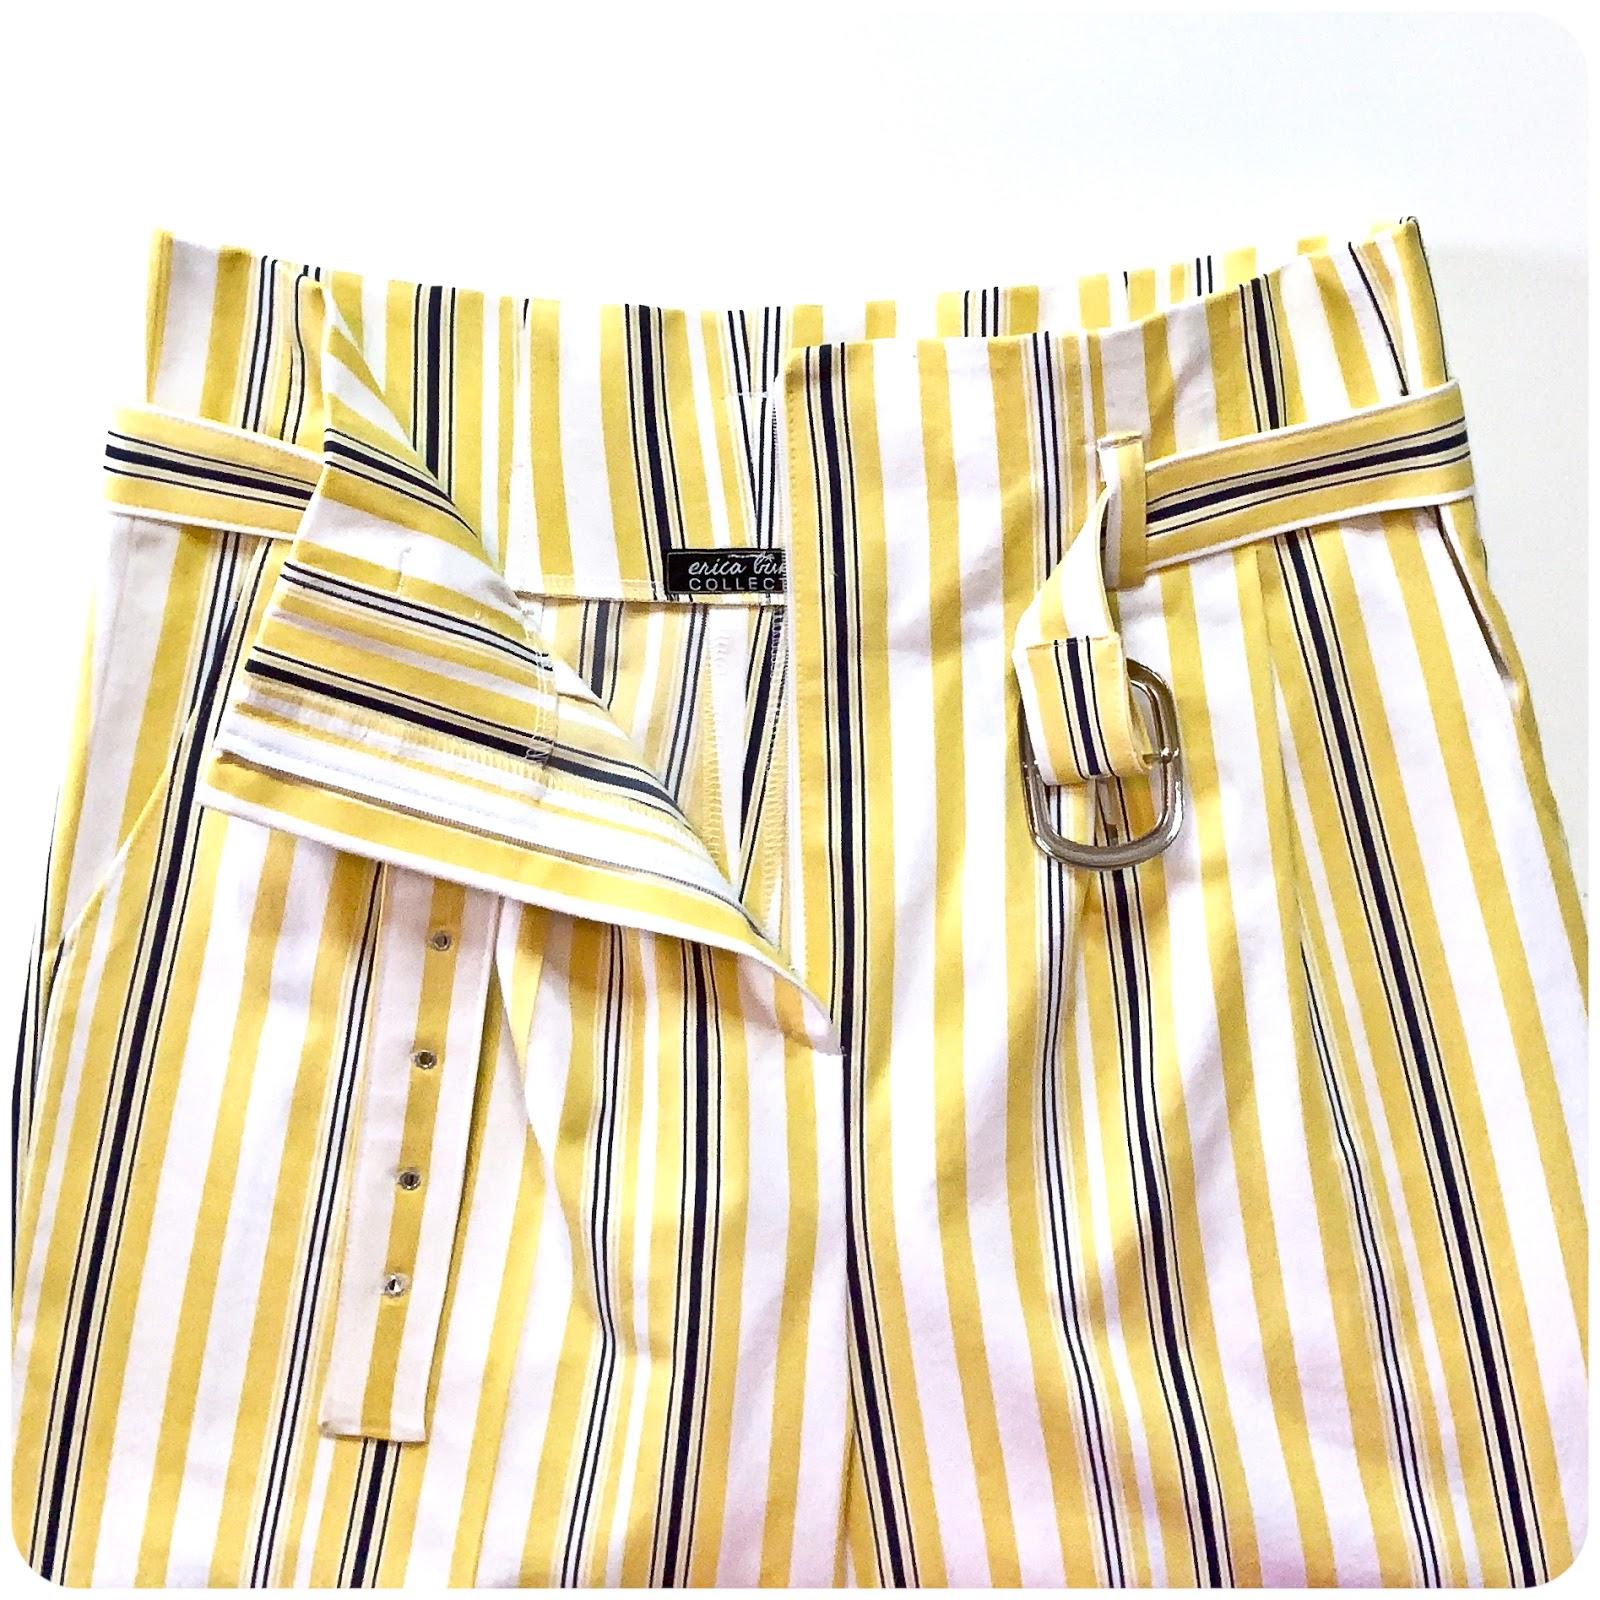 McCall's 7726 High-Waisted Pants - Erica Bunker DIY Style!